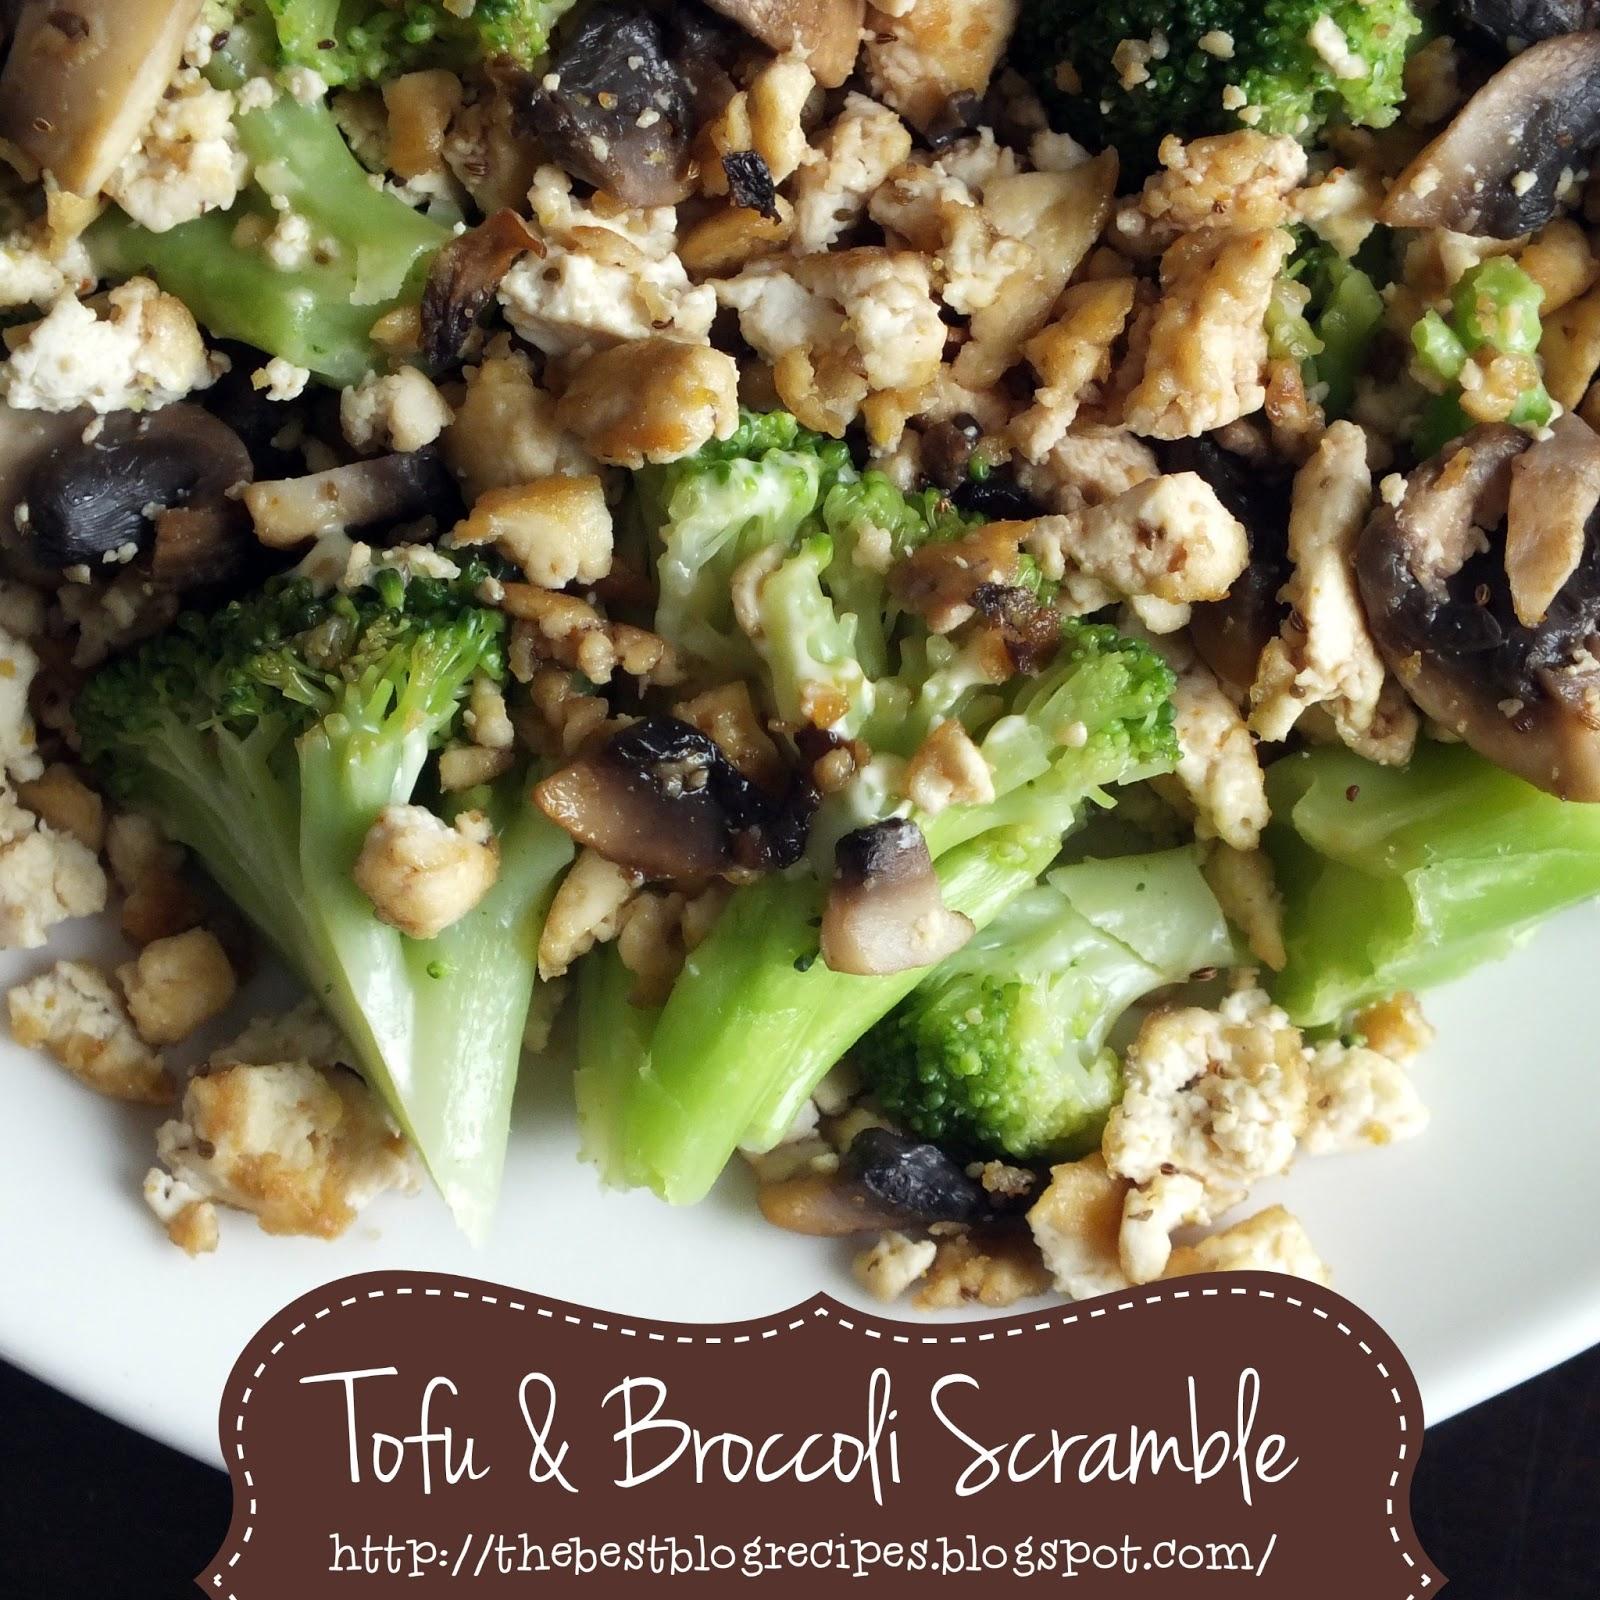 Here's a super yummy Tofu & Broccoli scramble that